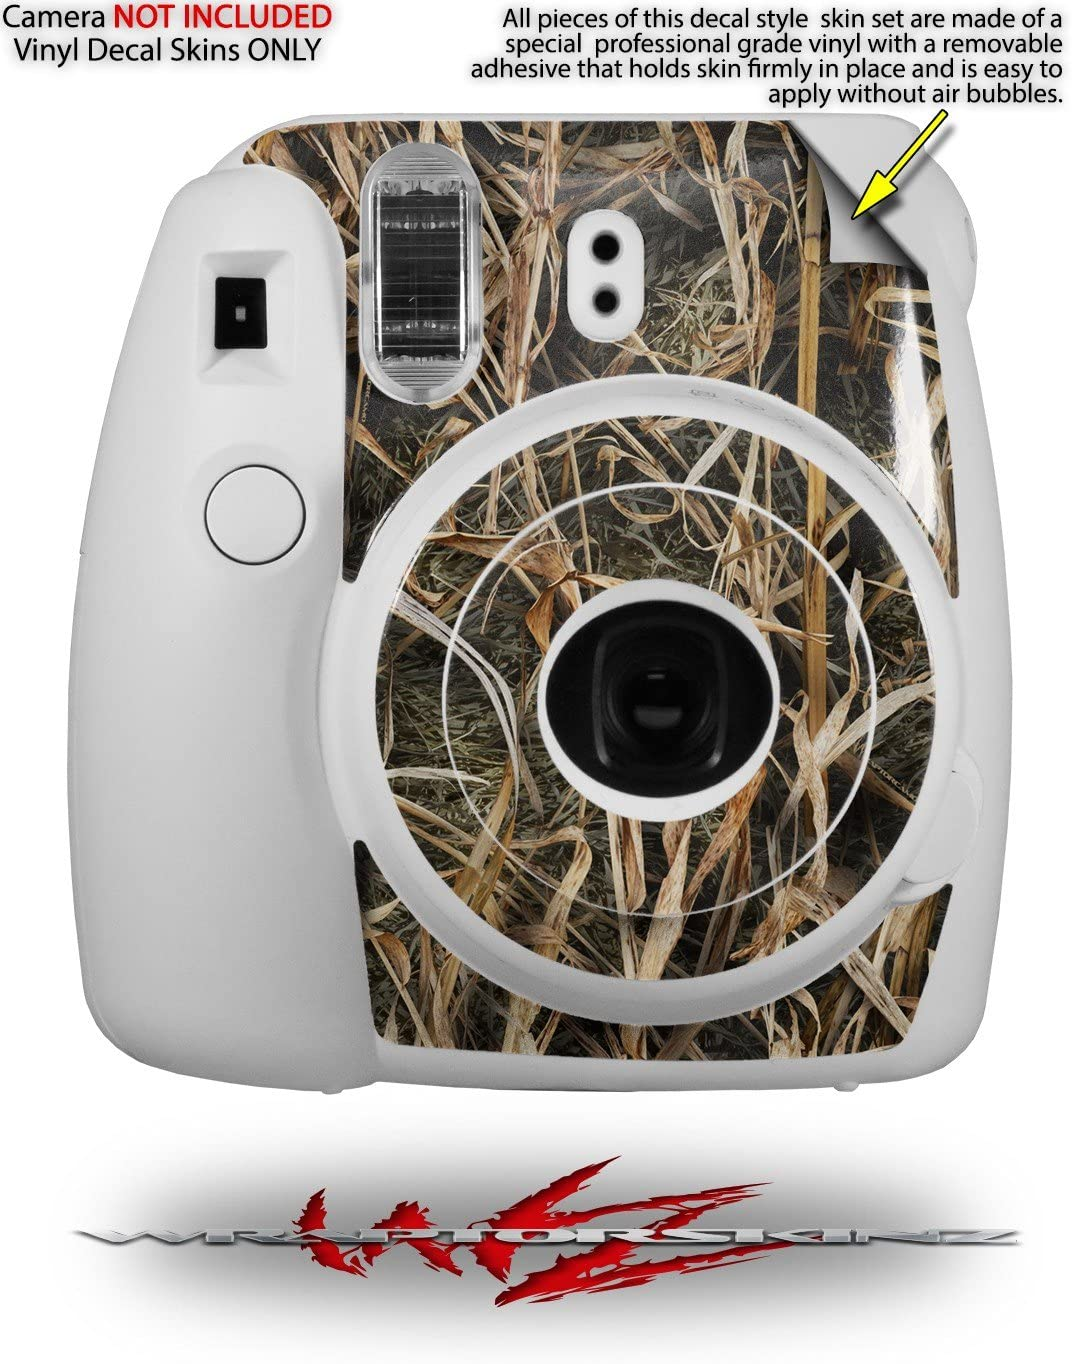 CAMERA NOT INCLUDED WraptorSkinz Skin Decal Wrap for Fujifilm Instax Mini 8 Camera Union Jack 02